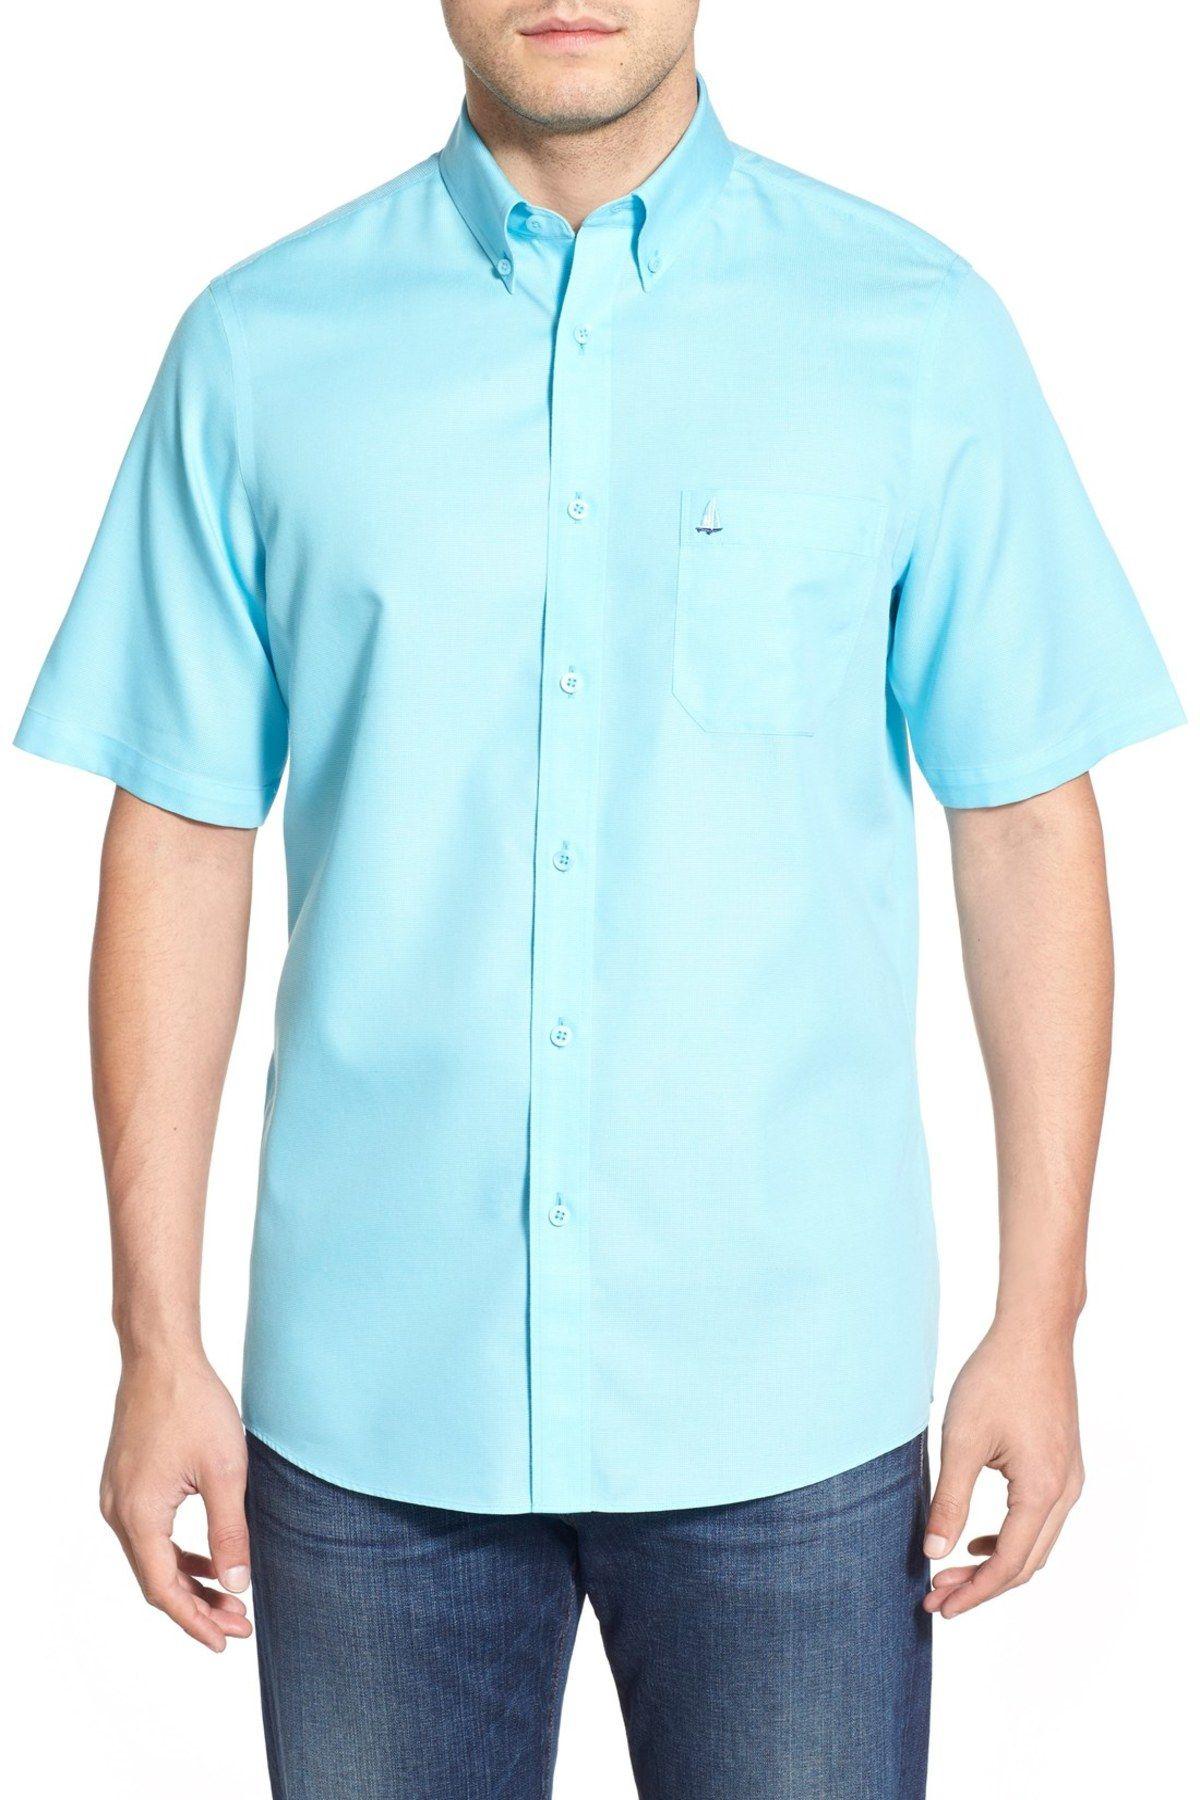 NORDSTROM MEN'S SHOP Smartcare(TM) Regular Fit Cotton